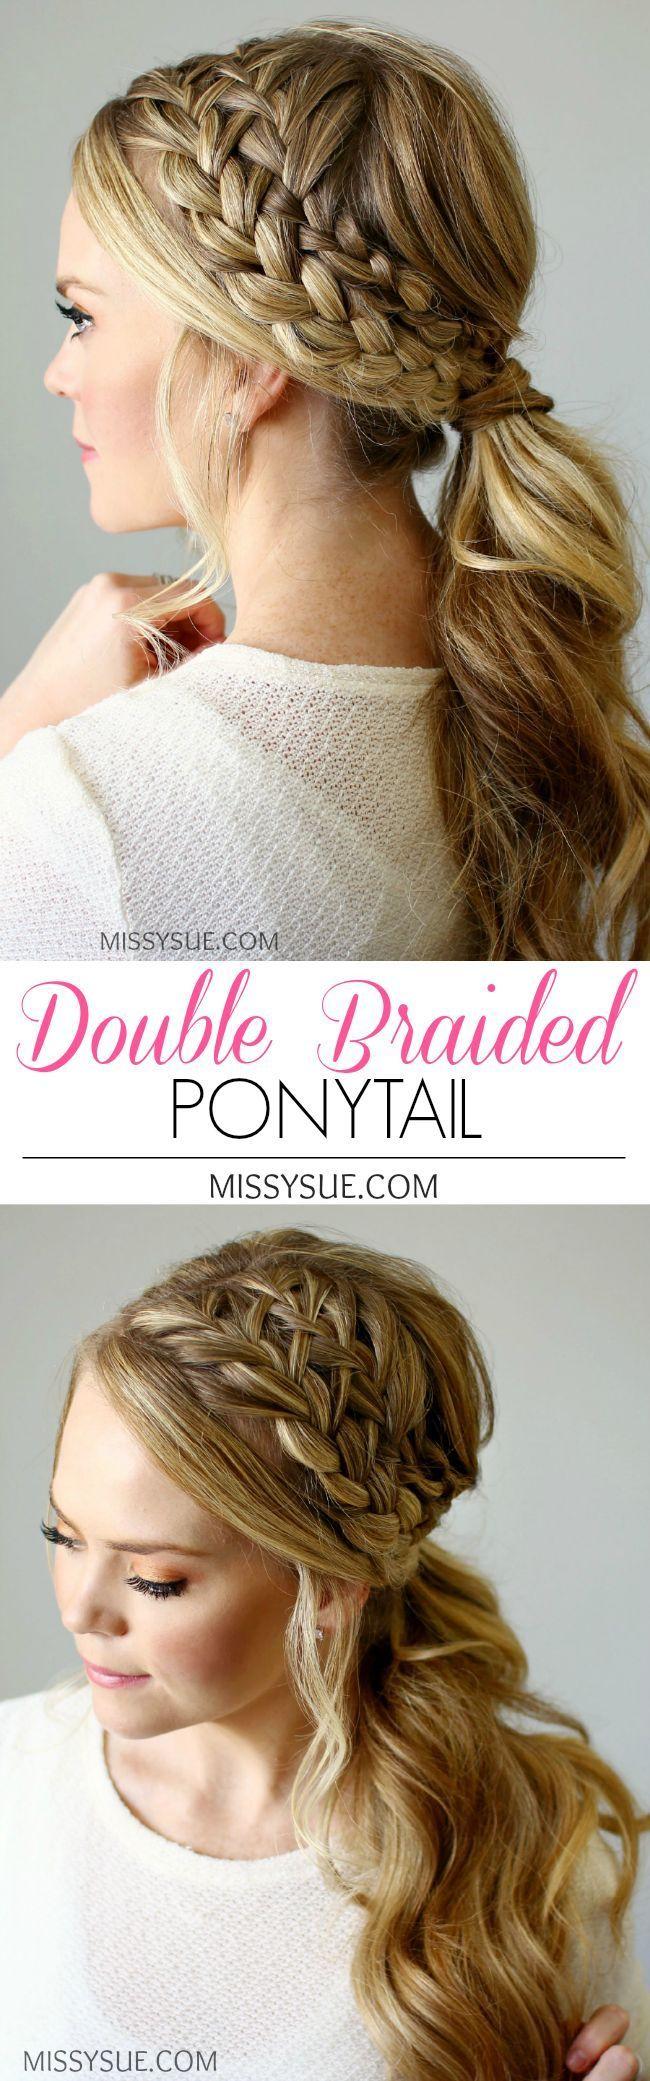 Double Braided Ponytail   http://MissySue.com top braid hairstyles, easy braids, kid braids, fashion braid